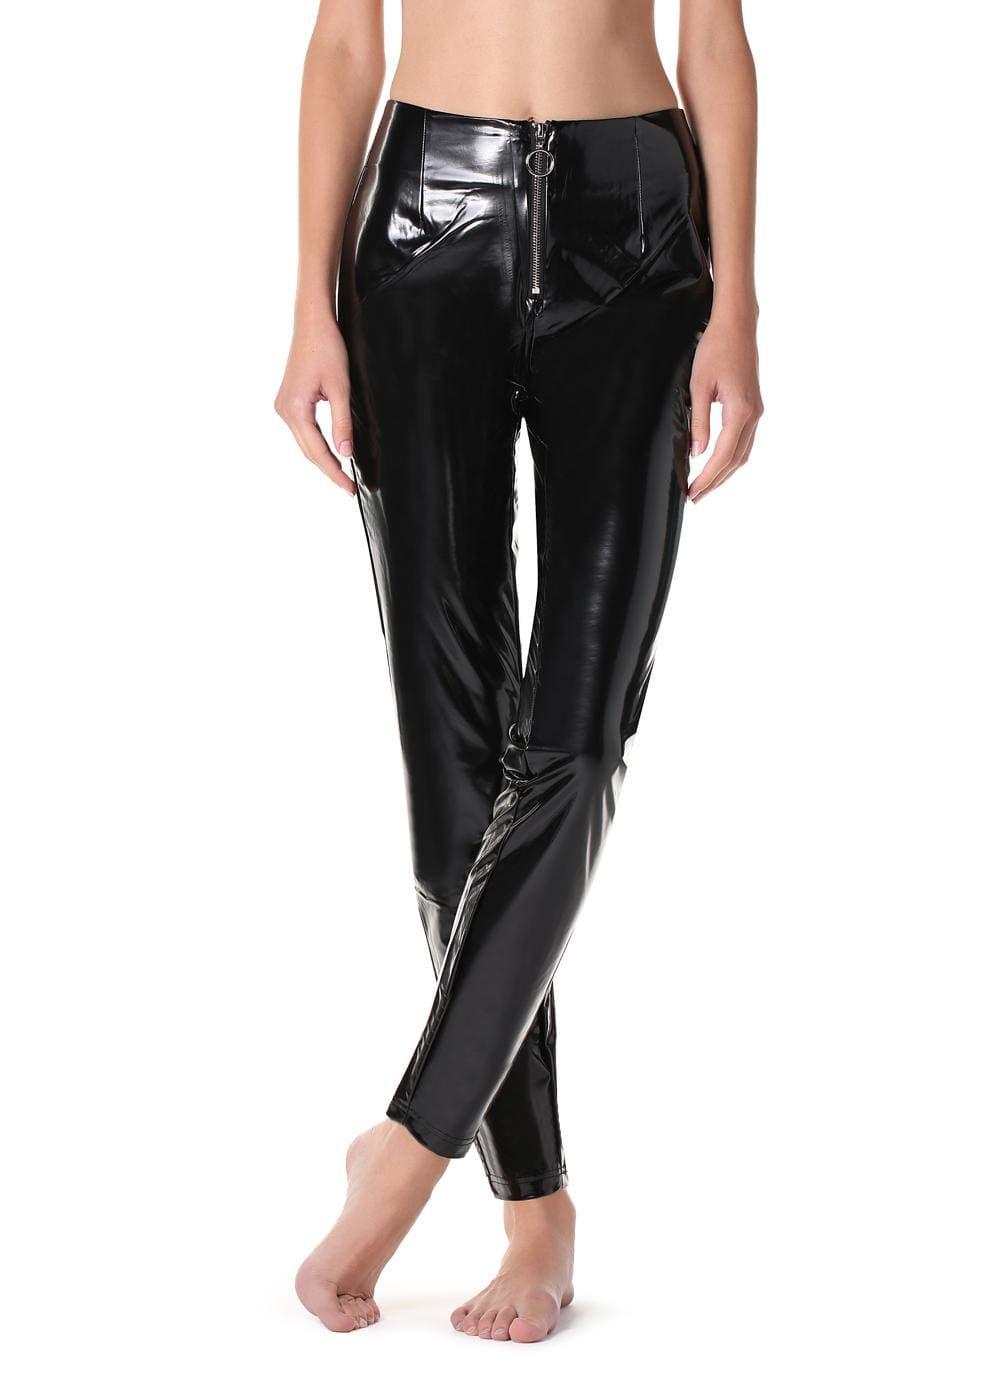 Leggings In Vinile Con Zip Calzedonia Pantaloni Di Pelle Vinile Moda